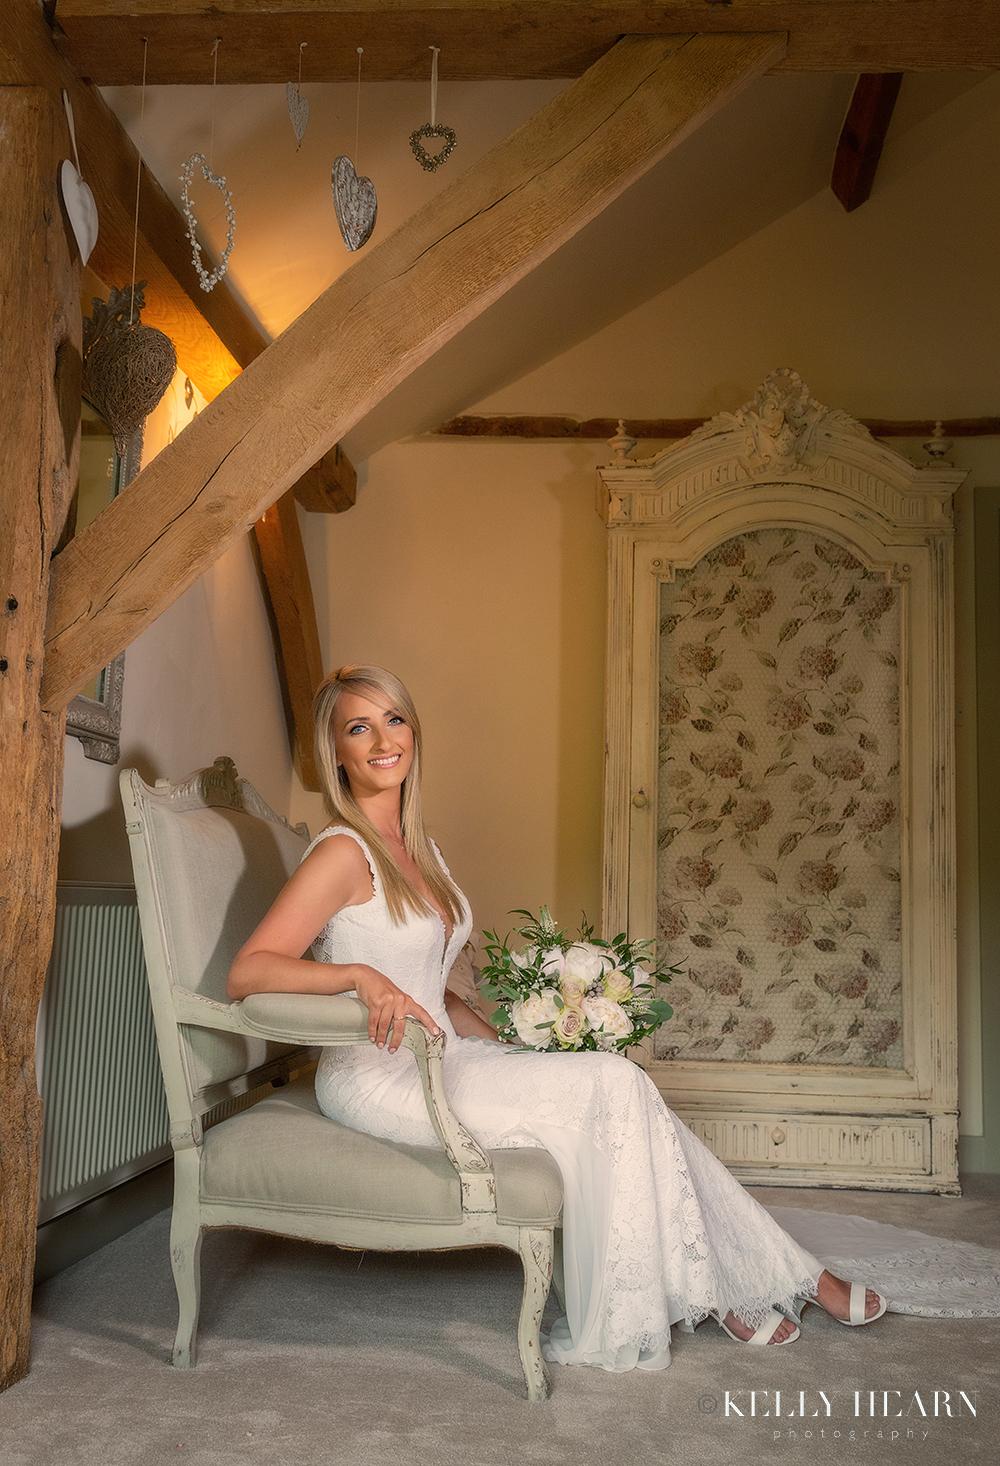 CW-Moore-Wedding-55.jpg#asset:2607